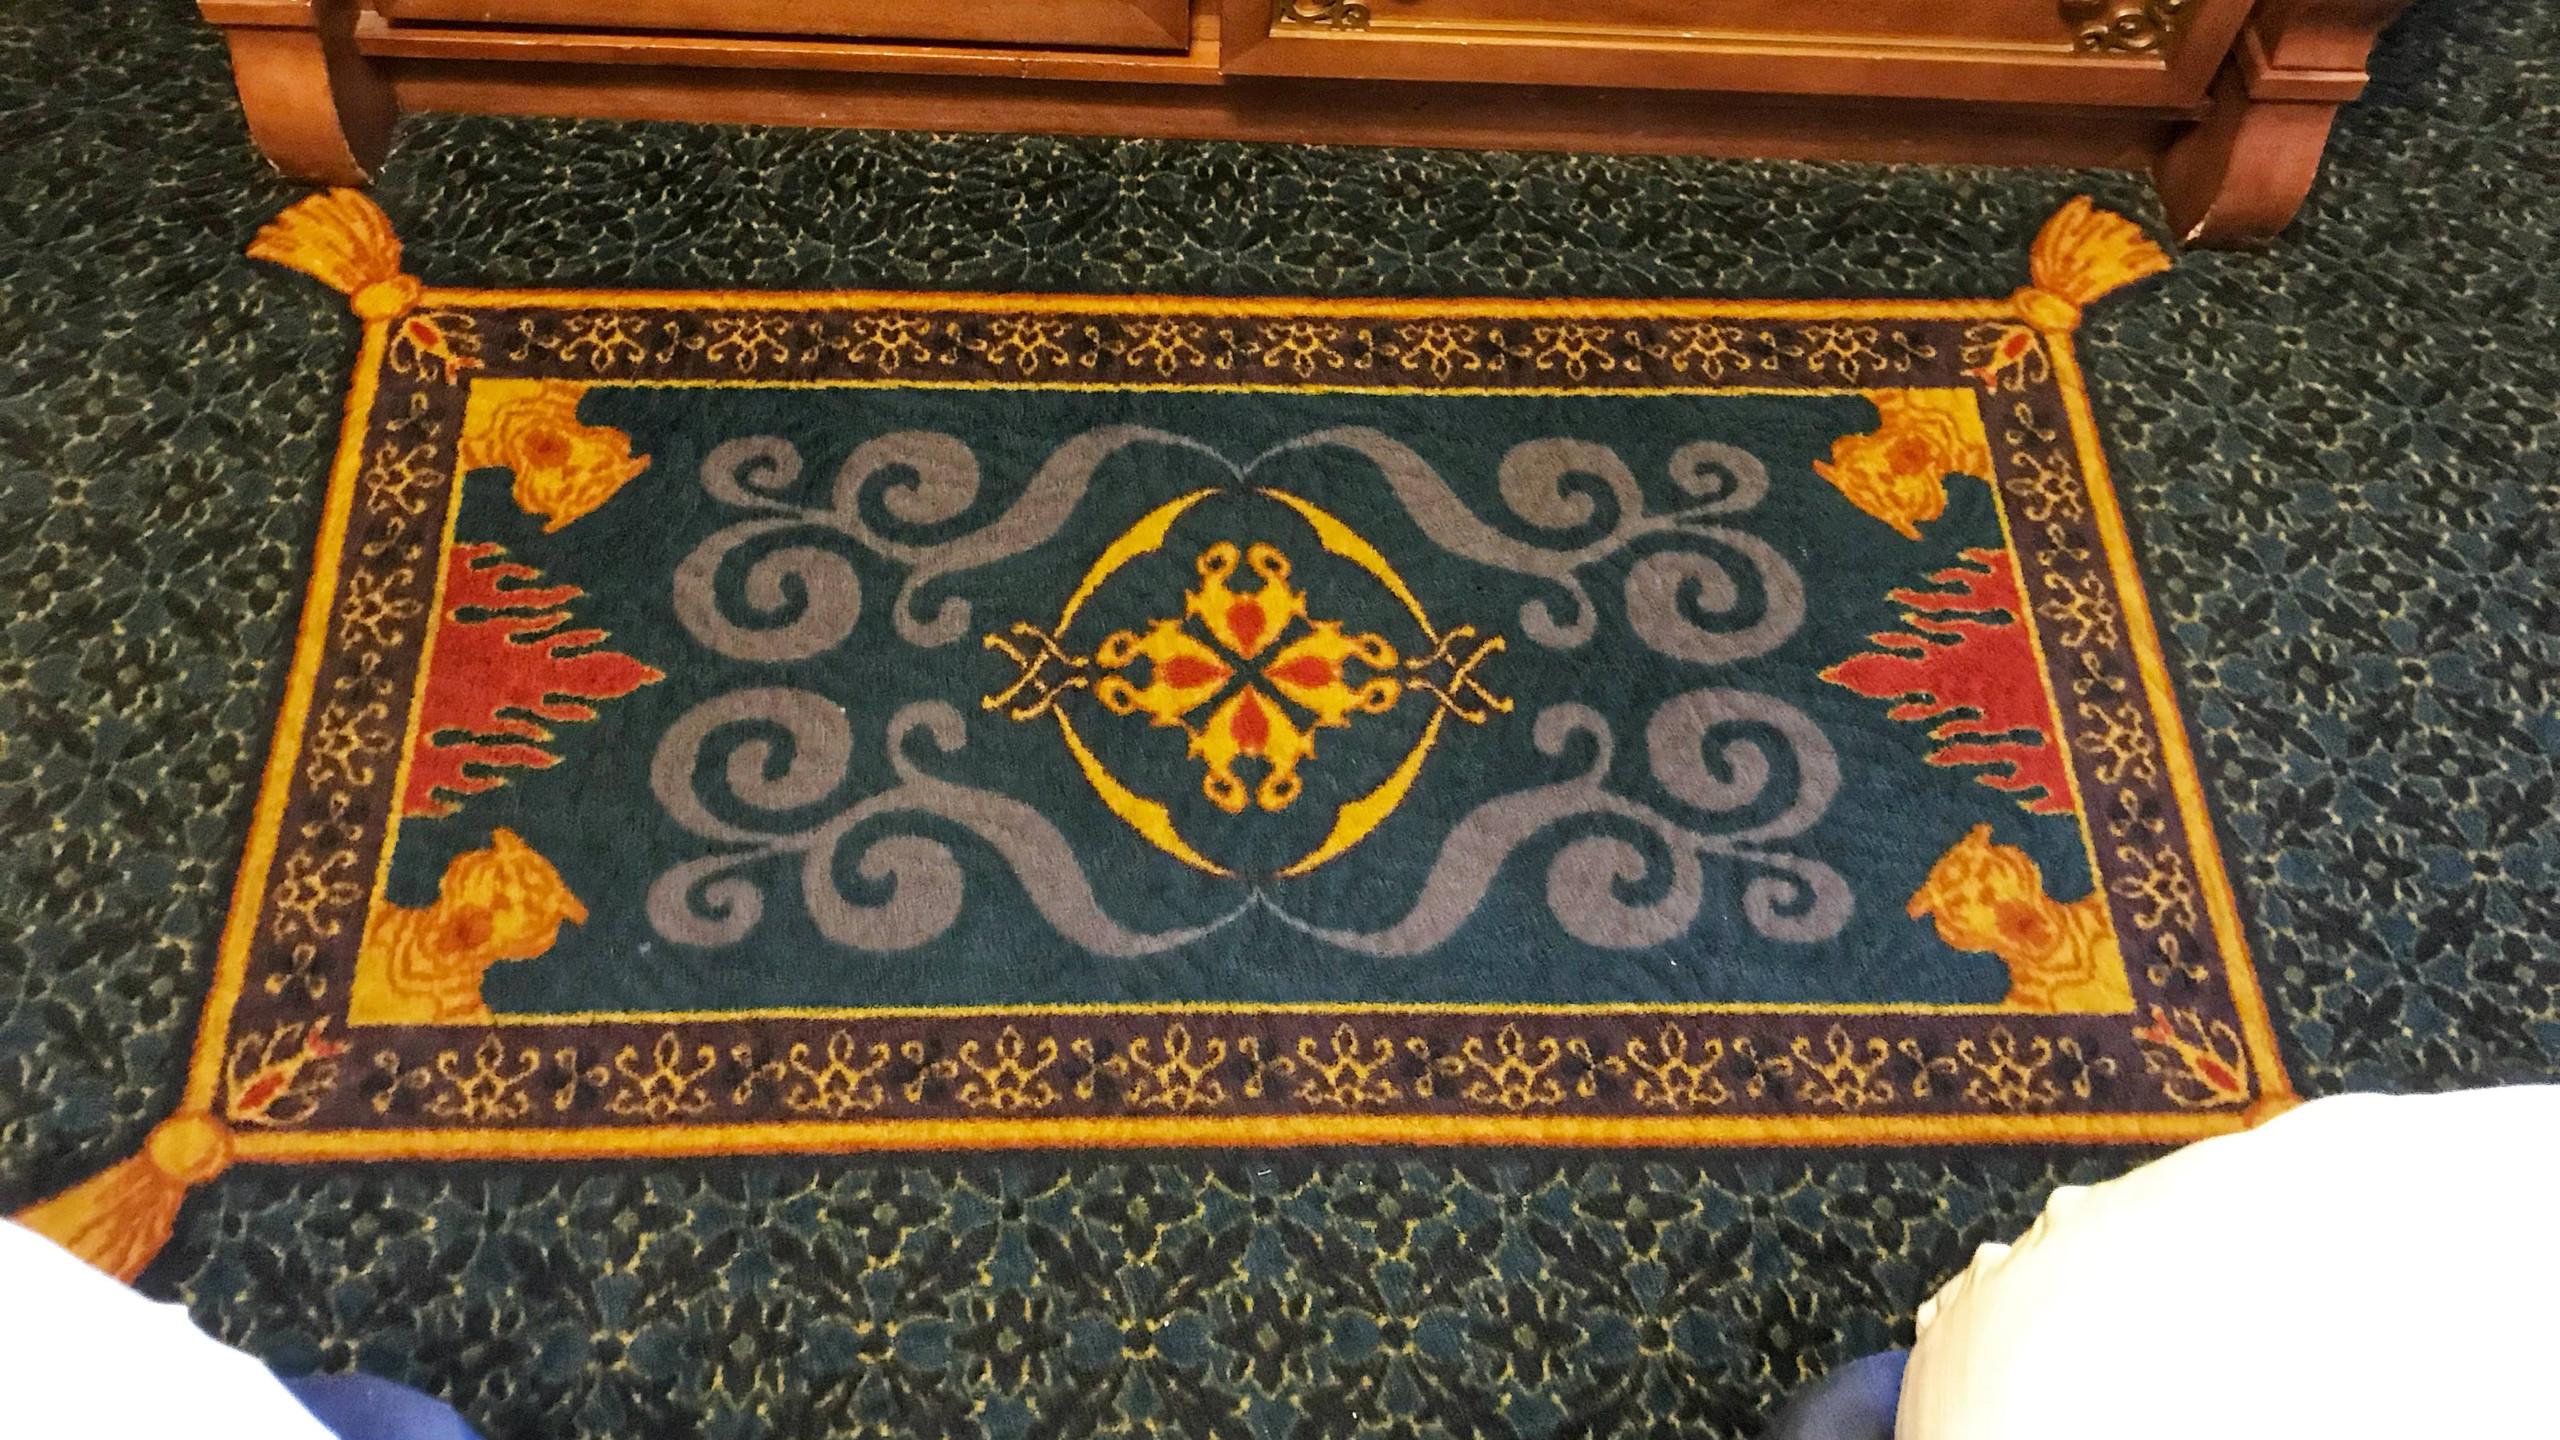 Aladdin's Magic Carpet